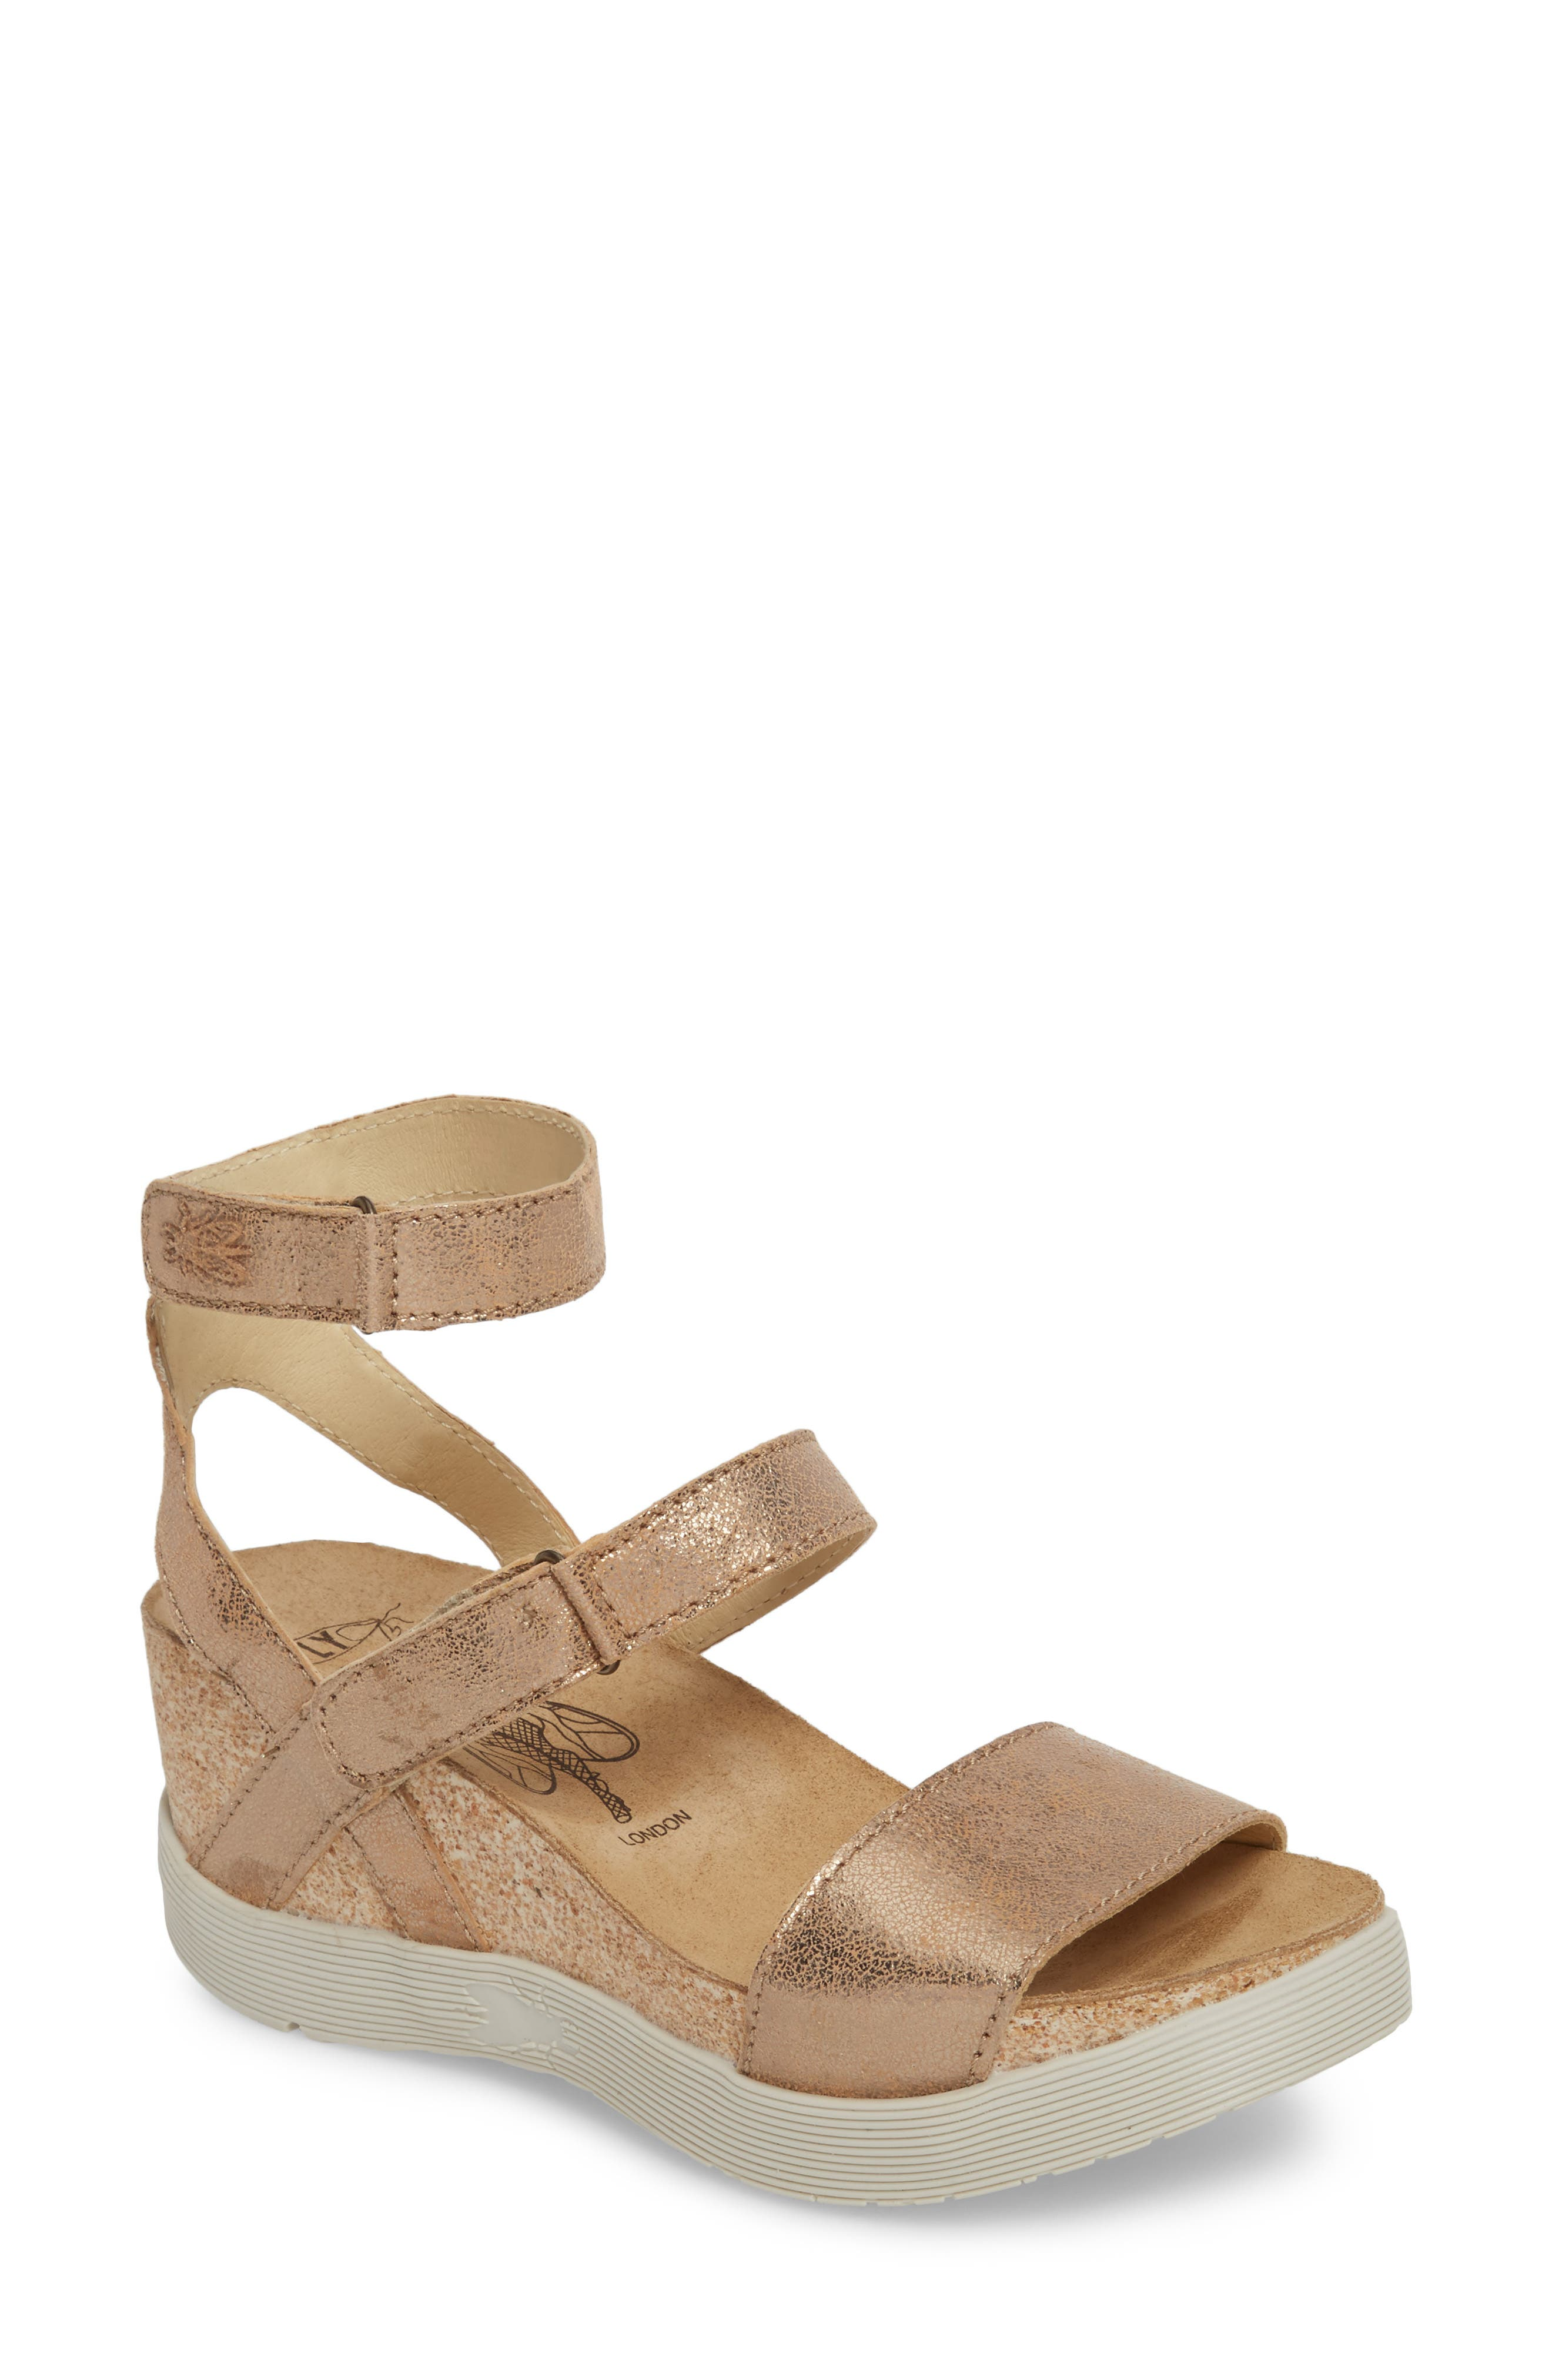 Wink Platform Sandal,                             Main thumbnail 1, color,                             LUNA COOL LEATHER